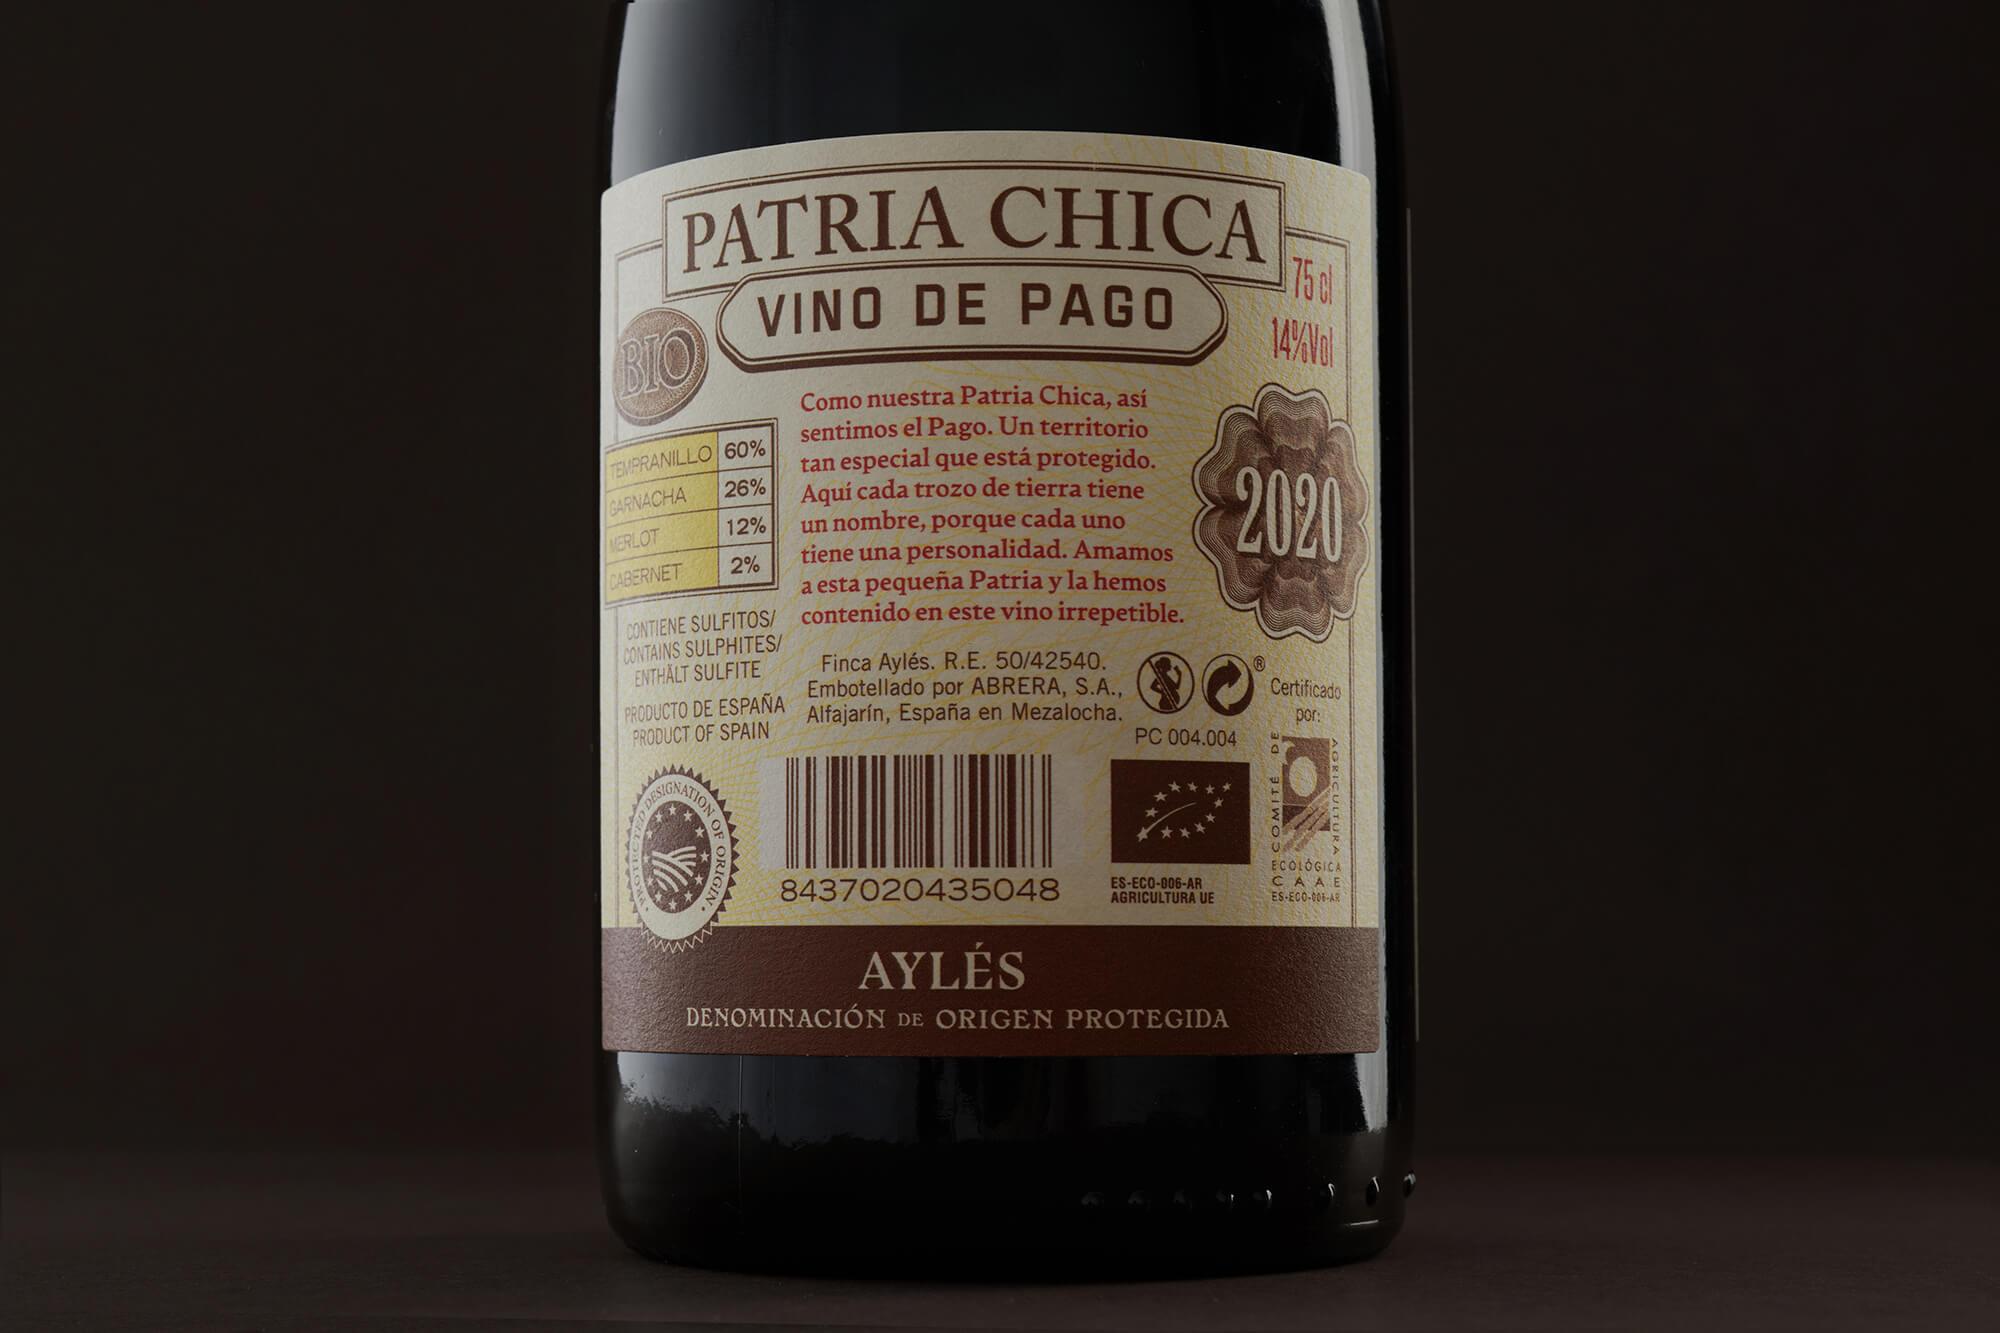 PATRIA CHICA7